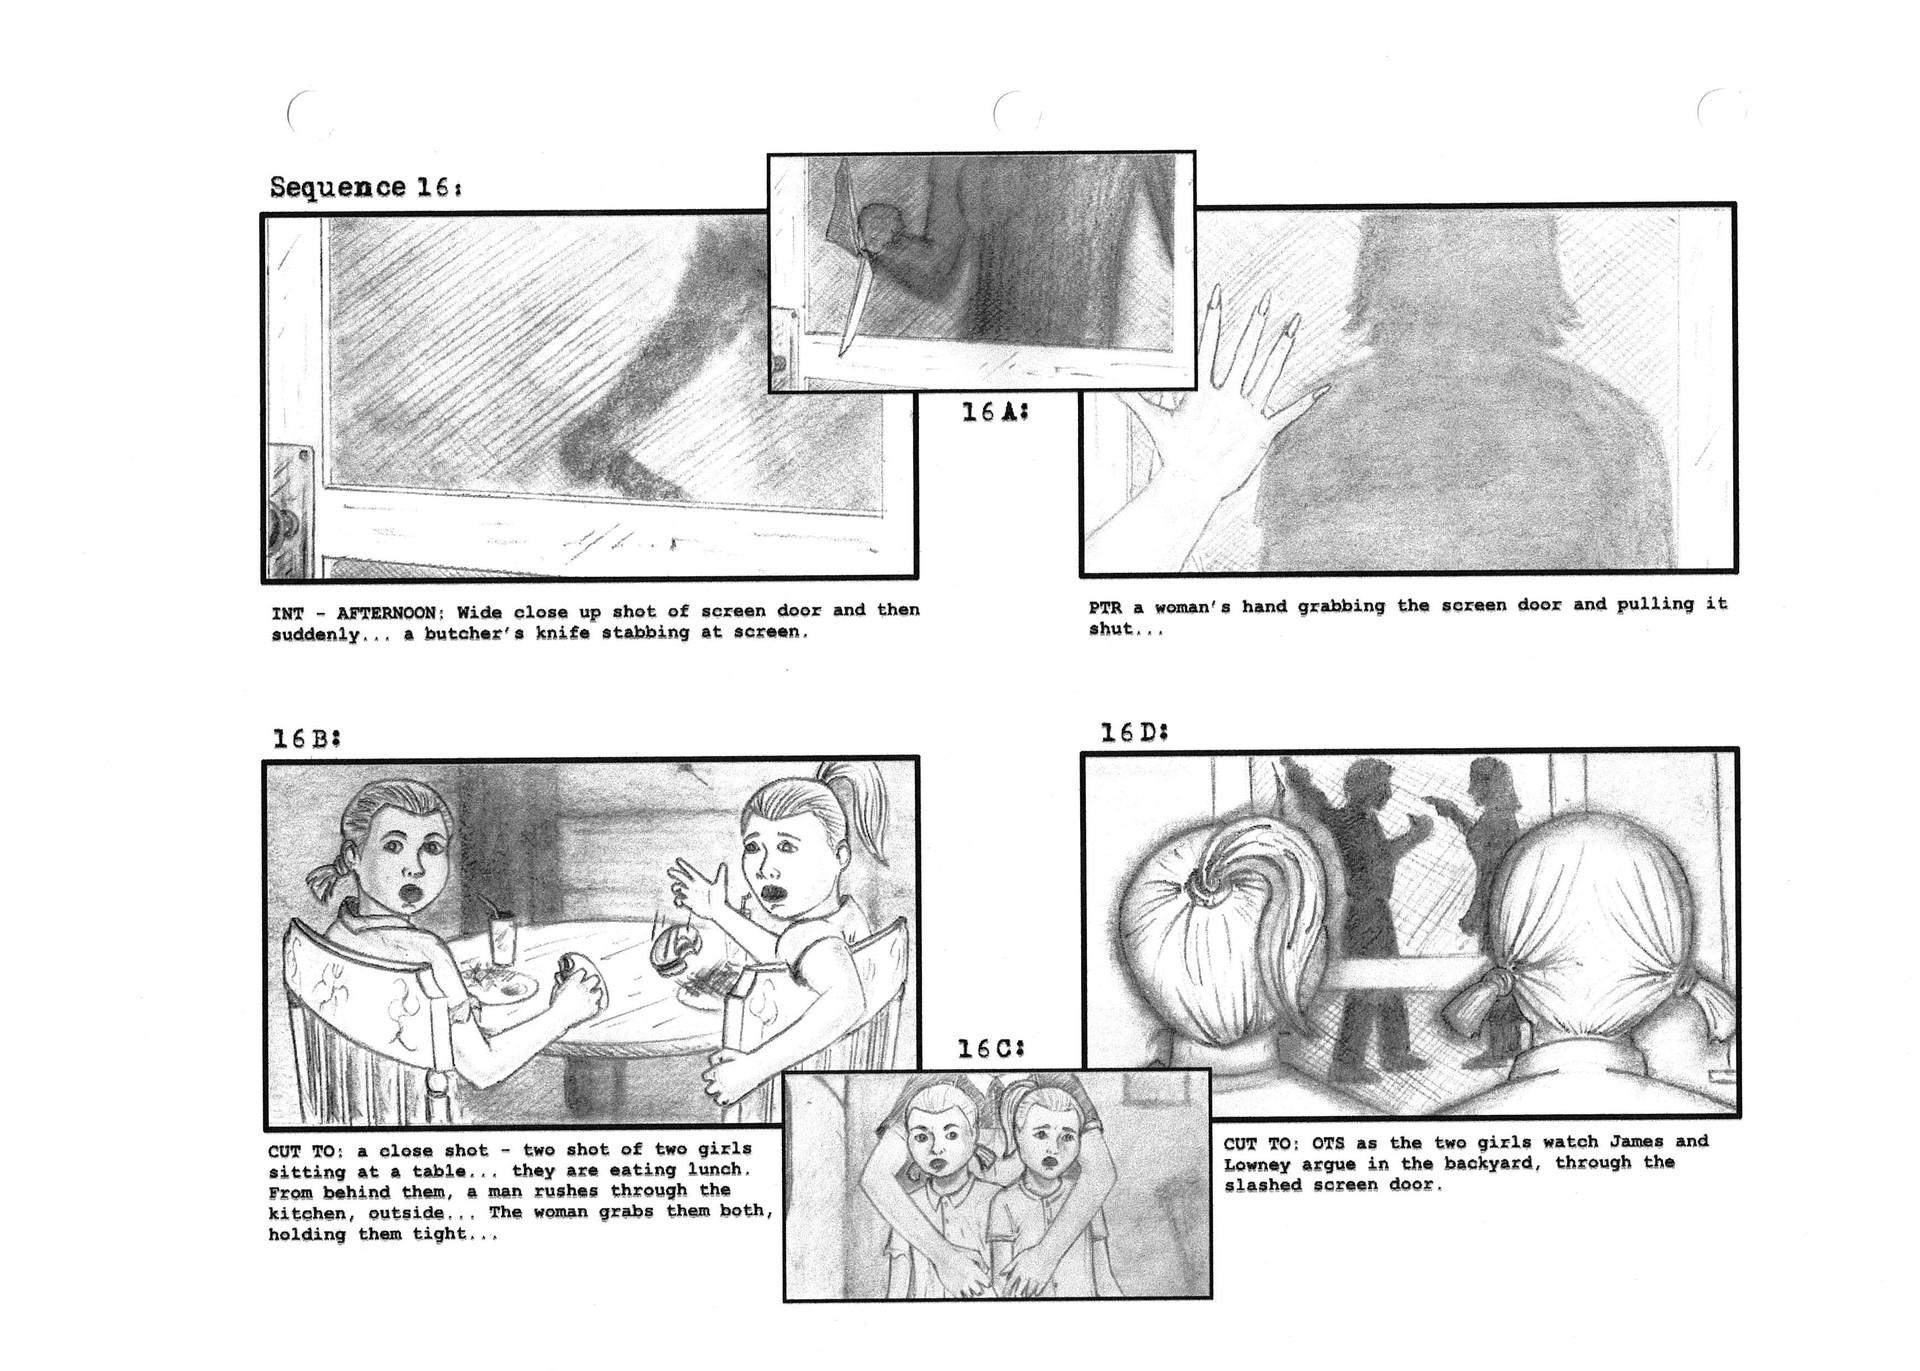 Dwayne stacho tlhwc storyboards 15